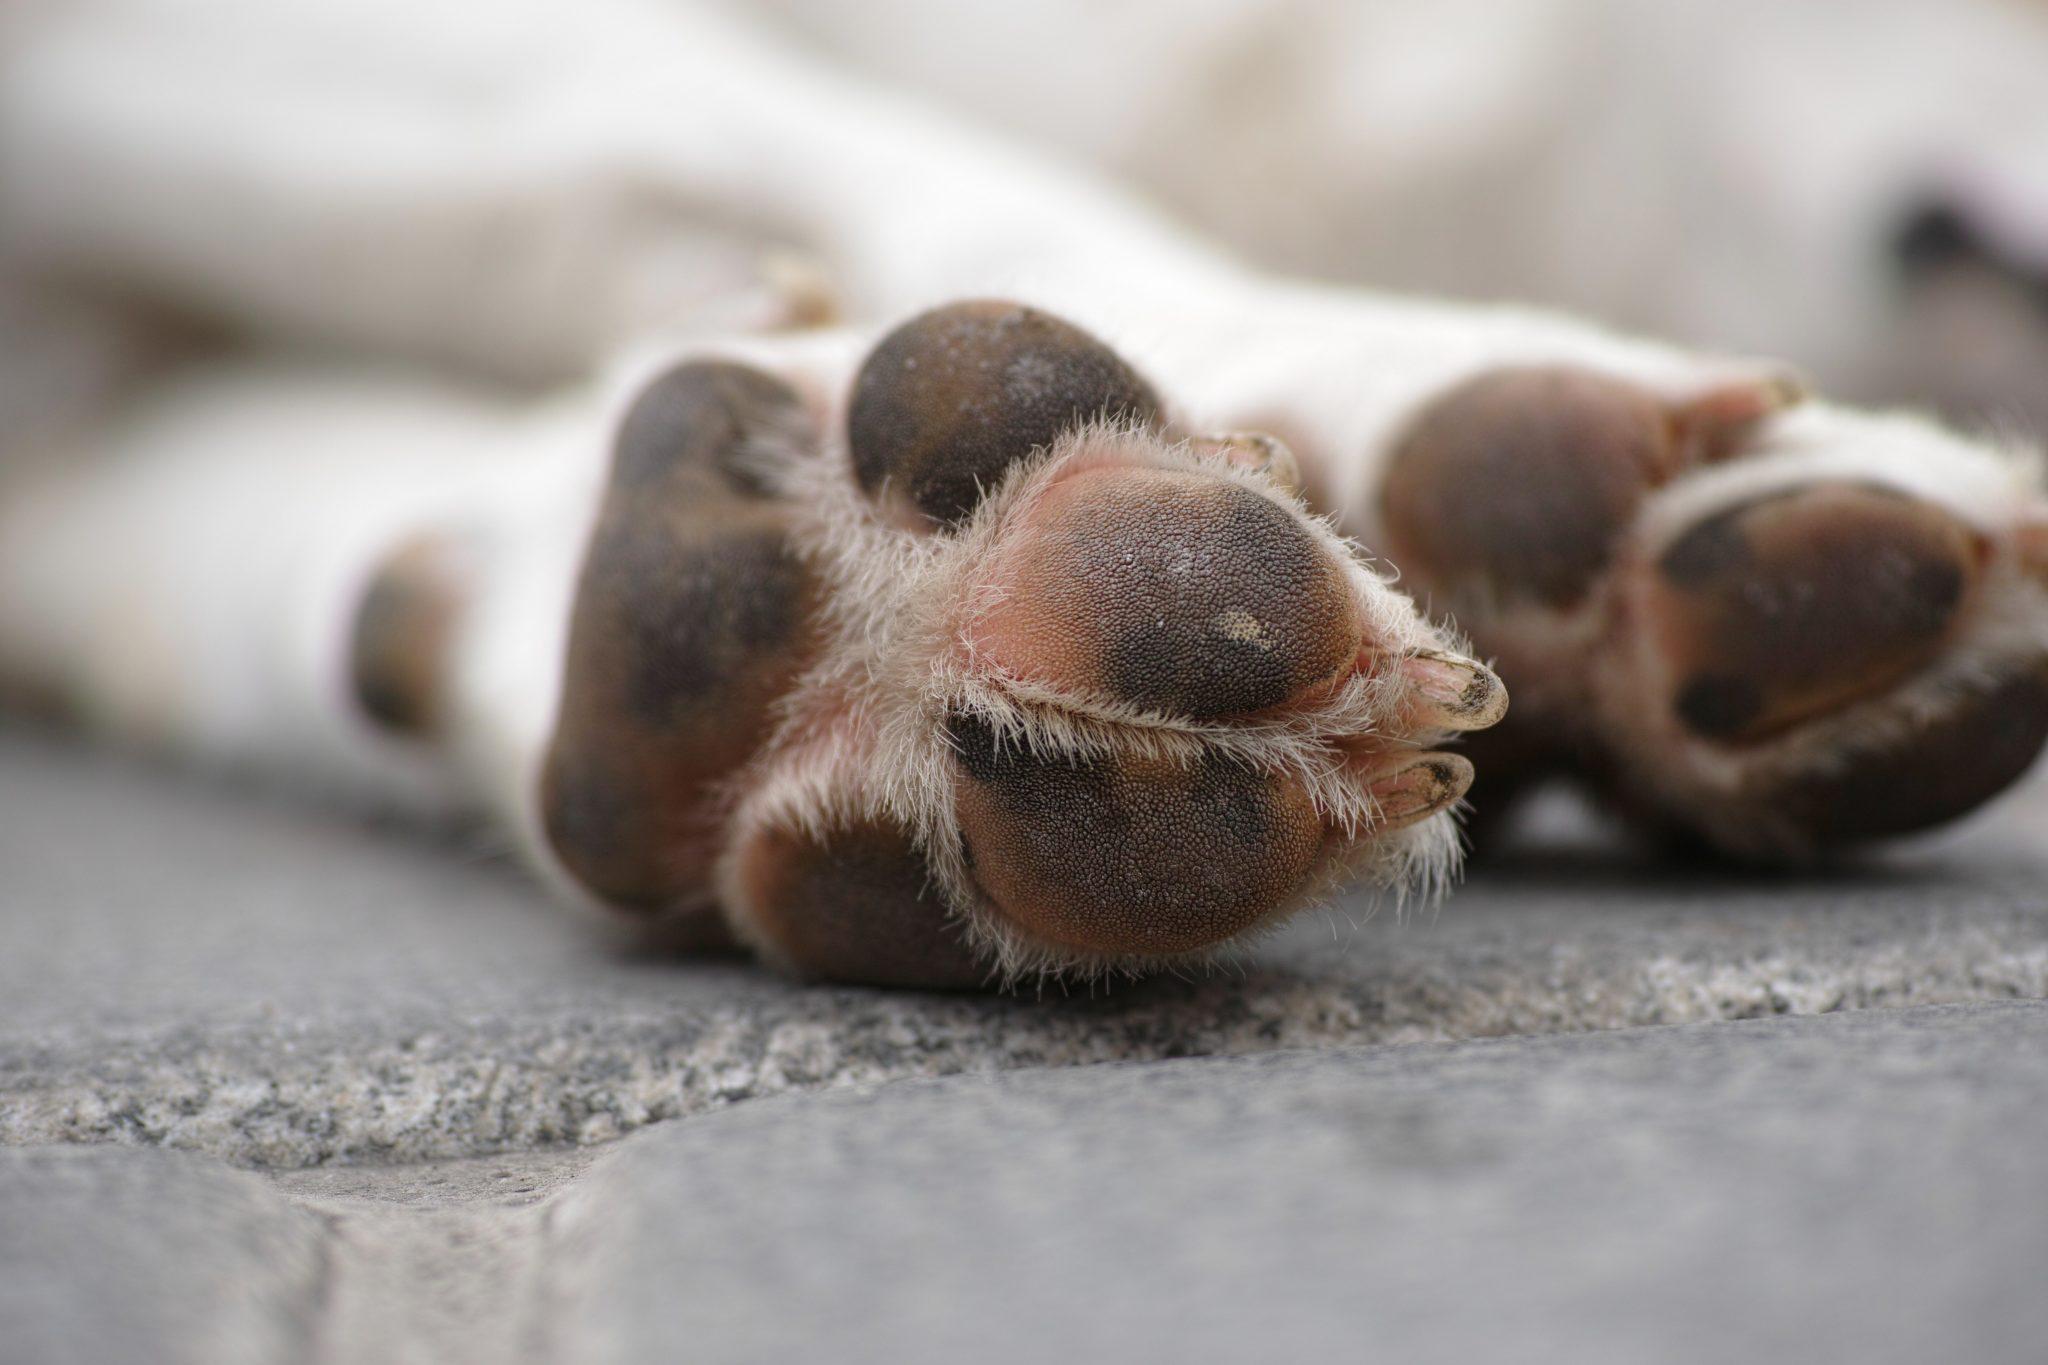 close up of dog paws